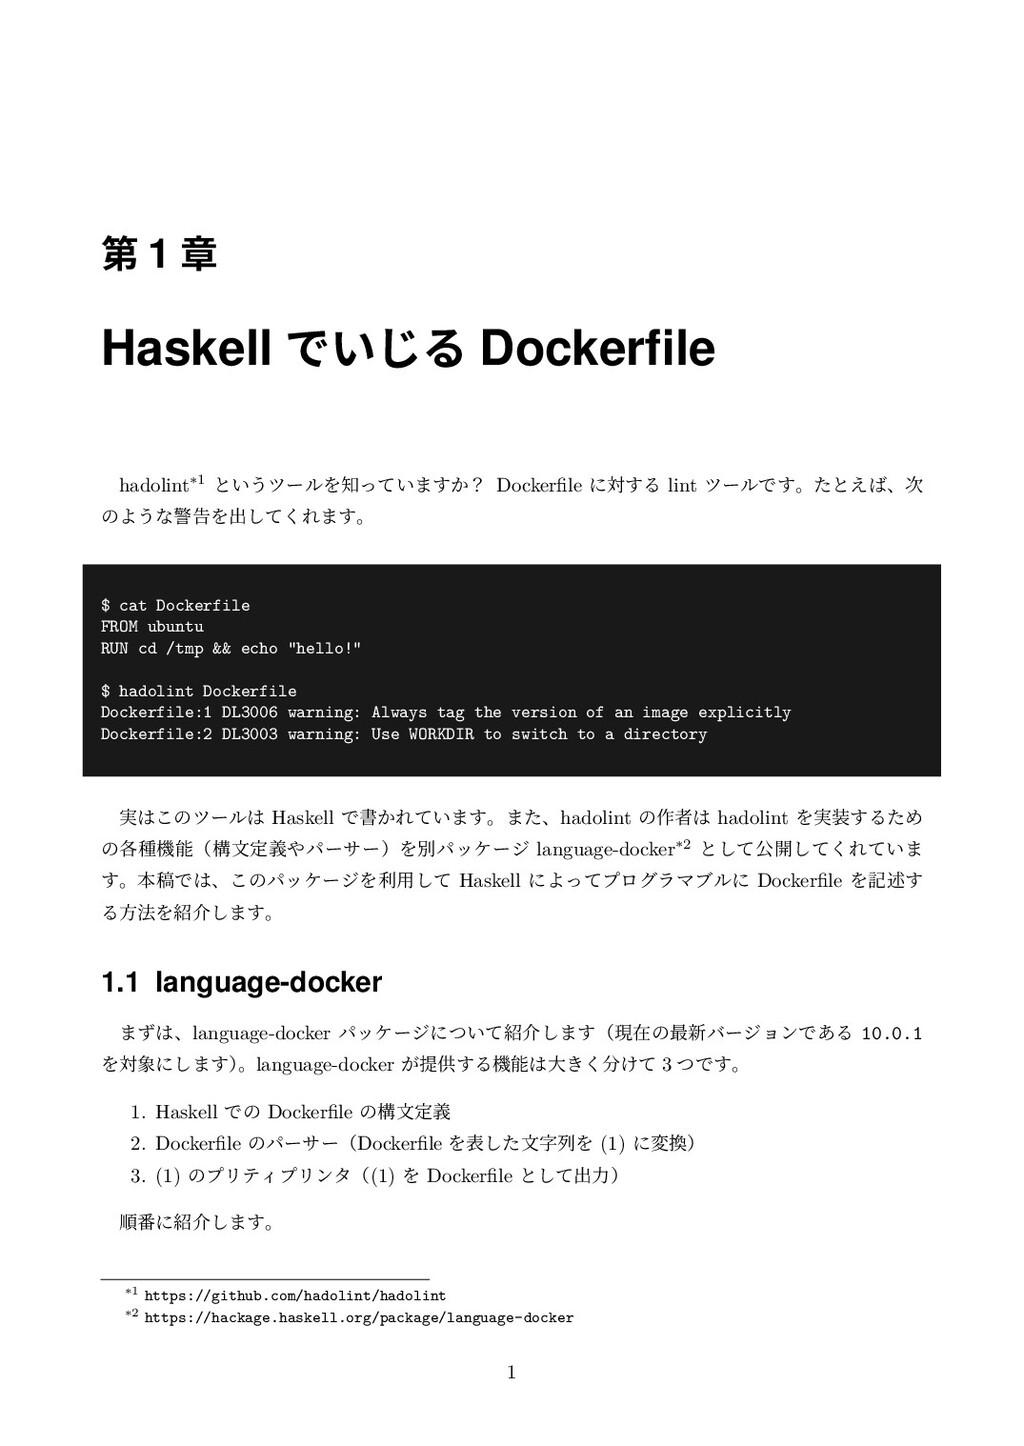 ୈ 1 ষ Haskell Ͱ͍͡Δ Dockerfile hadolint*1 ͱ͍͏πʔϧΛ...